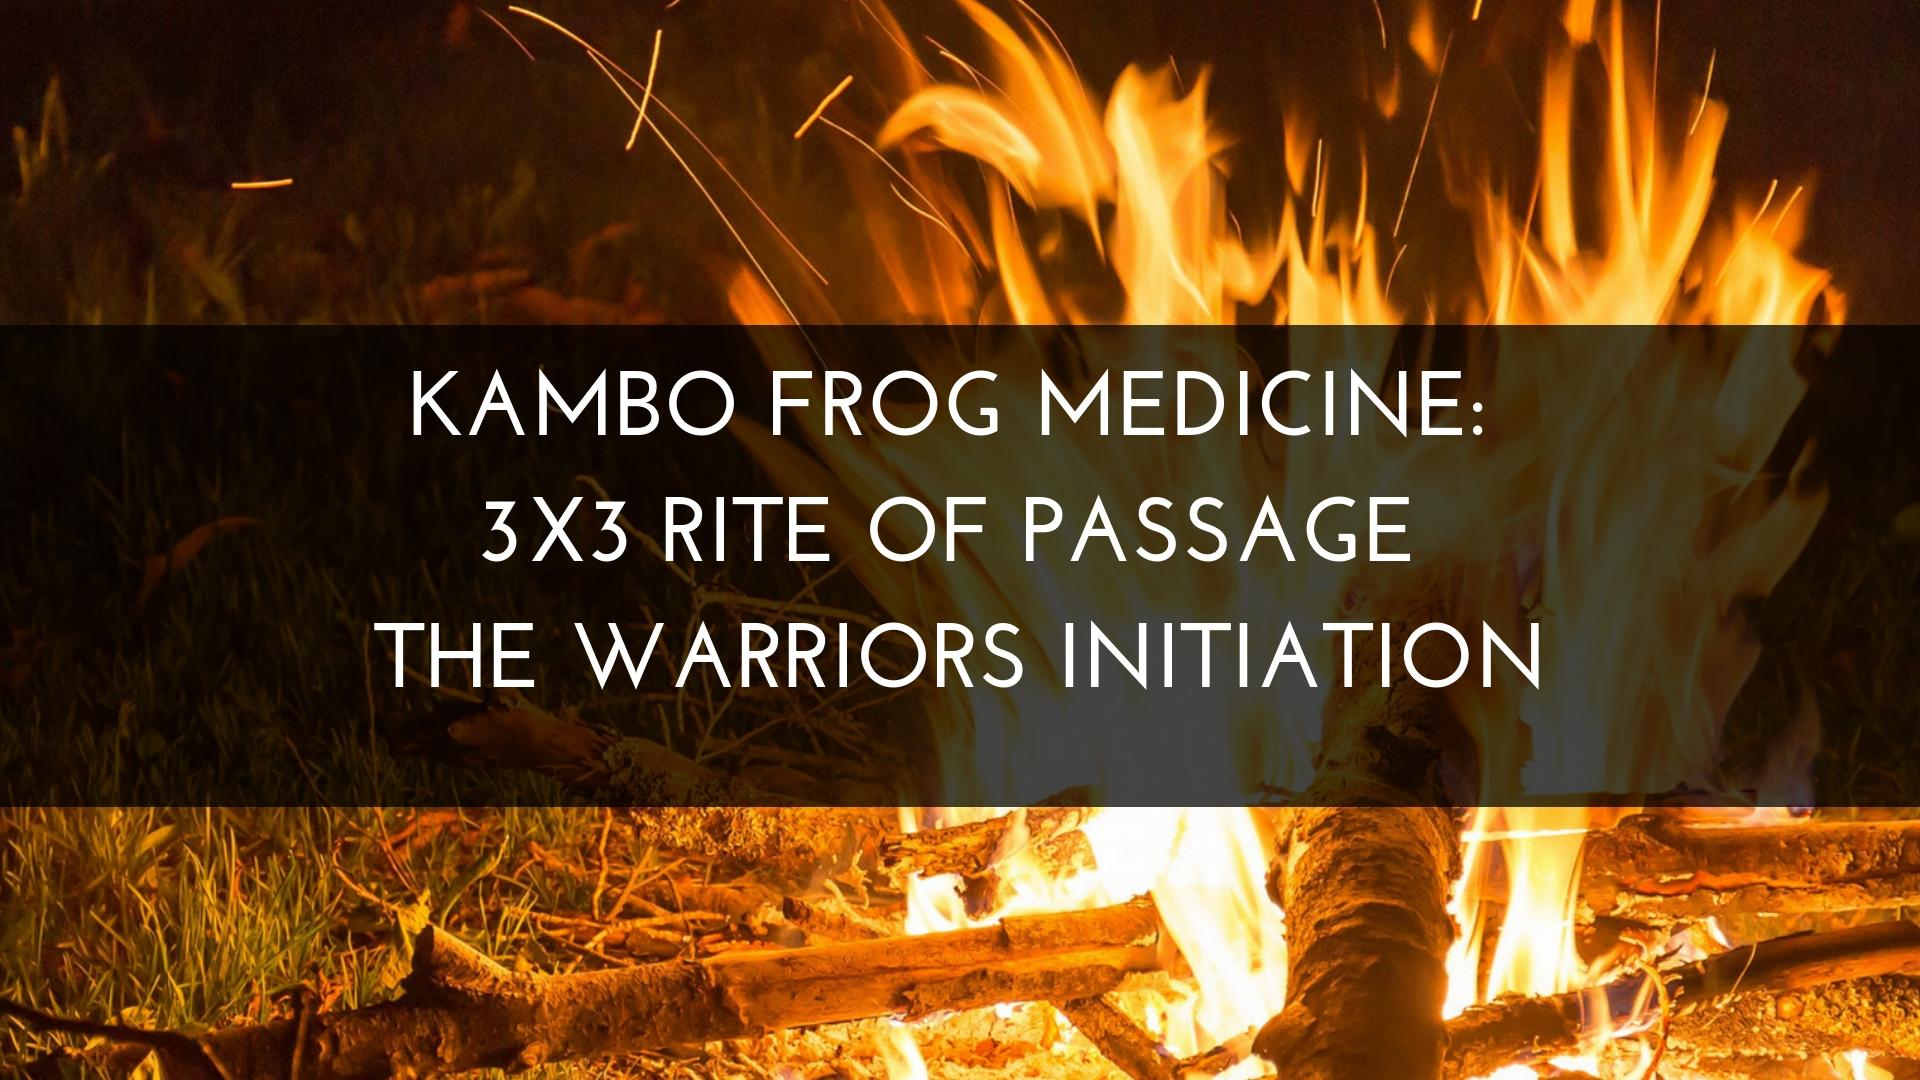 Kambo Frog Medicine 3X3 Rite of Passage: The Warriors Initiation